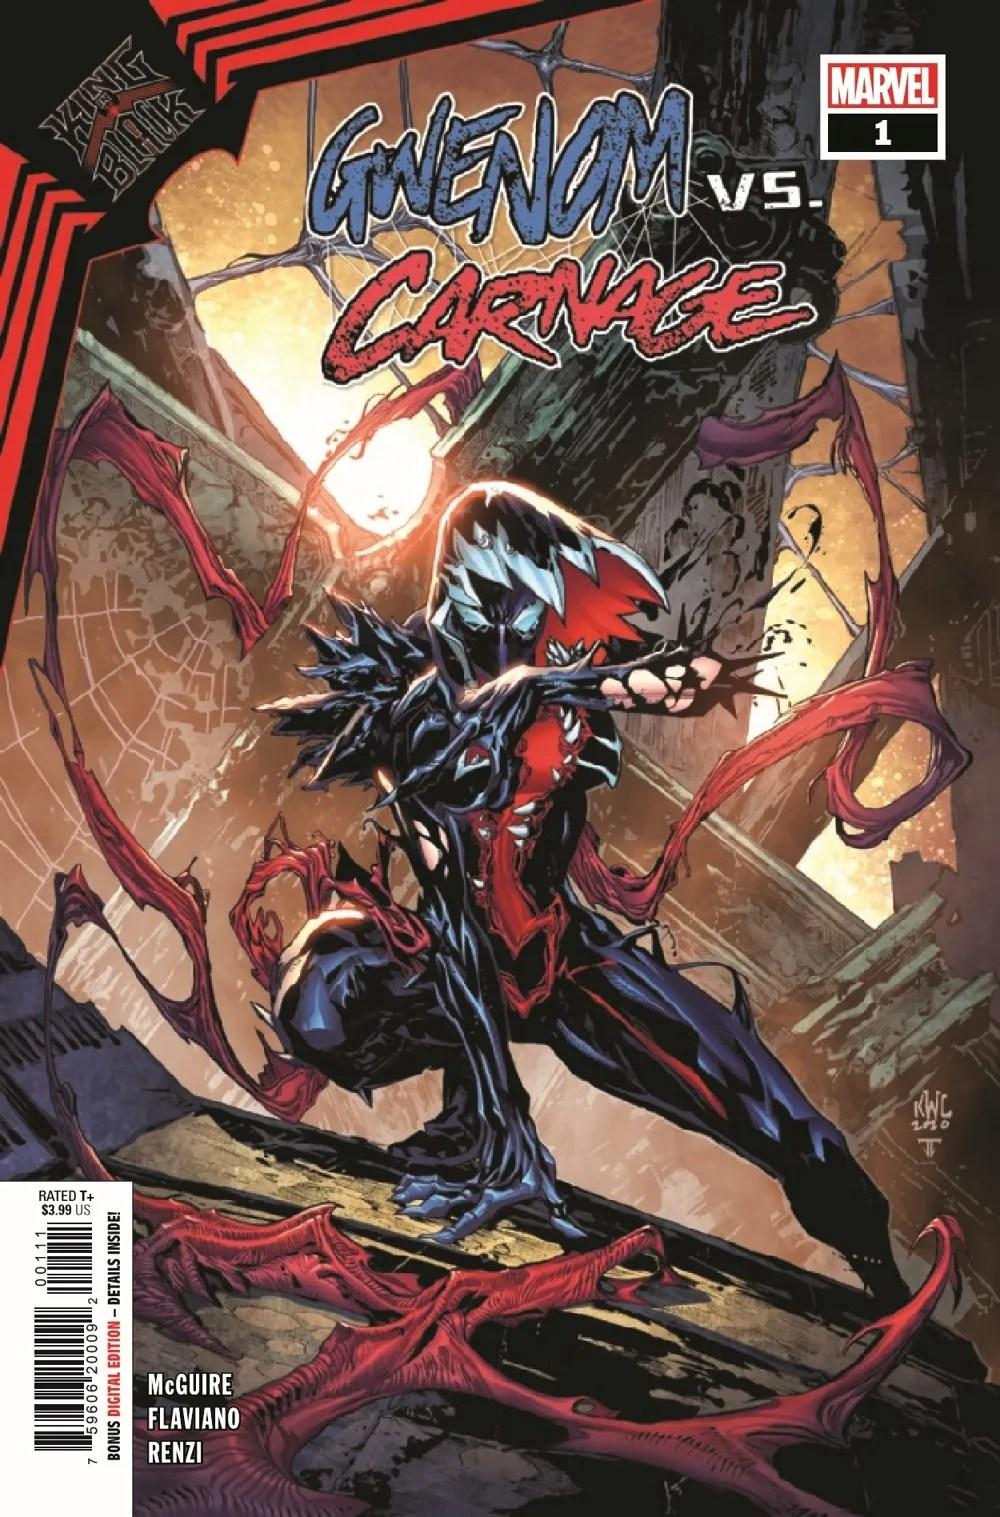 GWENOMVSCARNKIB2021001_Preview-1 ComicList Previews: KING IN BLACK GWENOM VS CARNAGE #1 (OF 3)